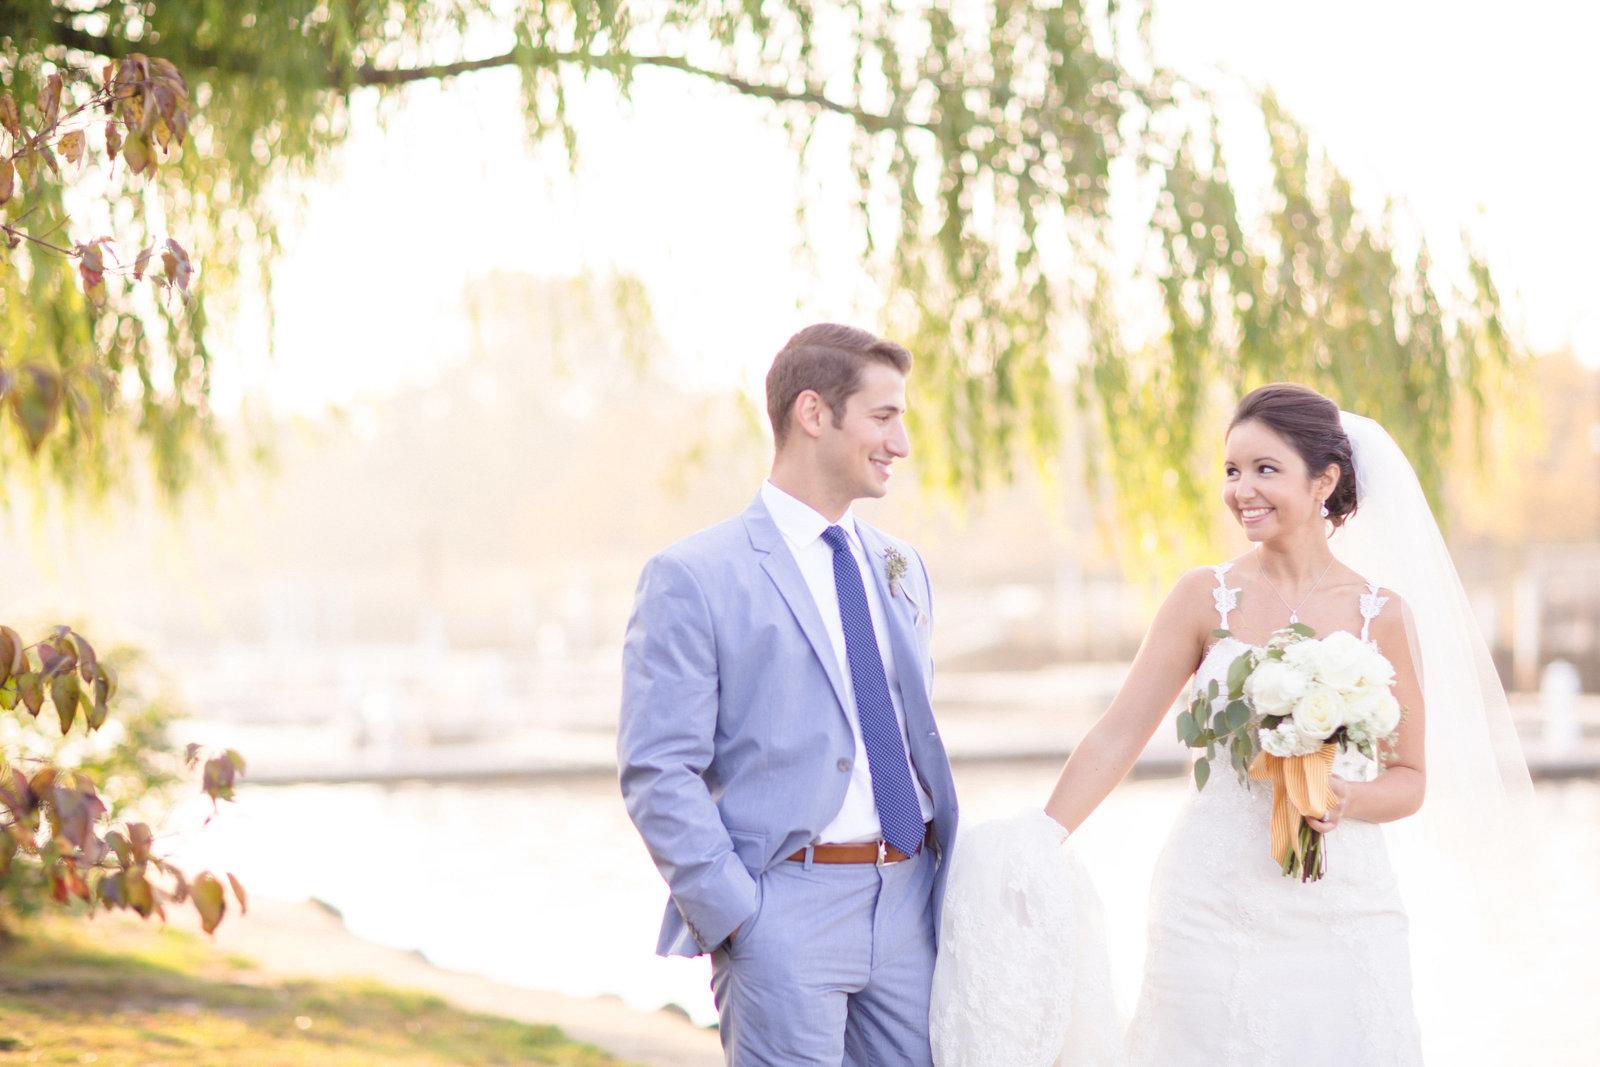 Wedding Photos- NYC Wedding Photographer-107